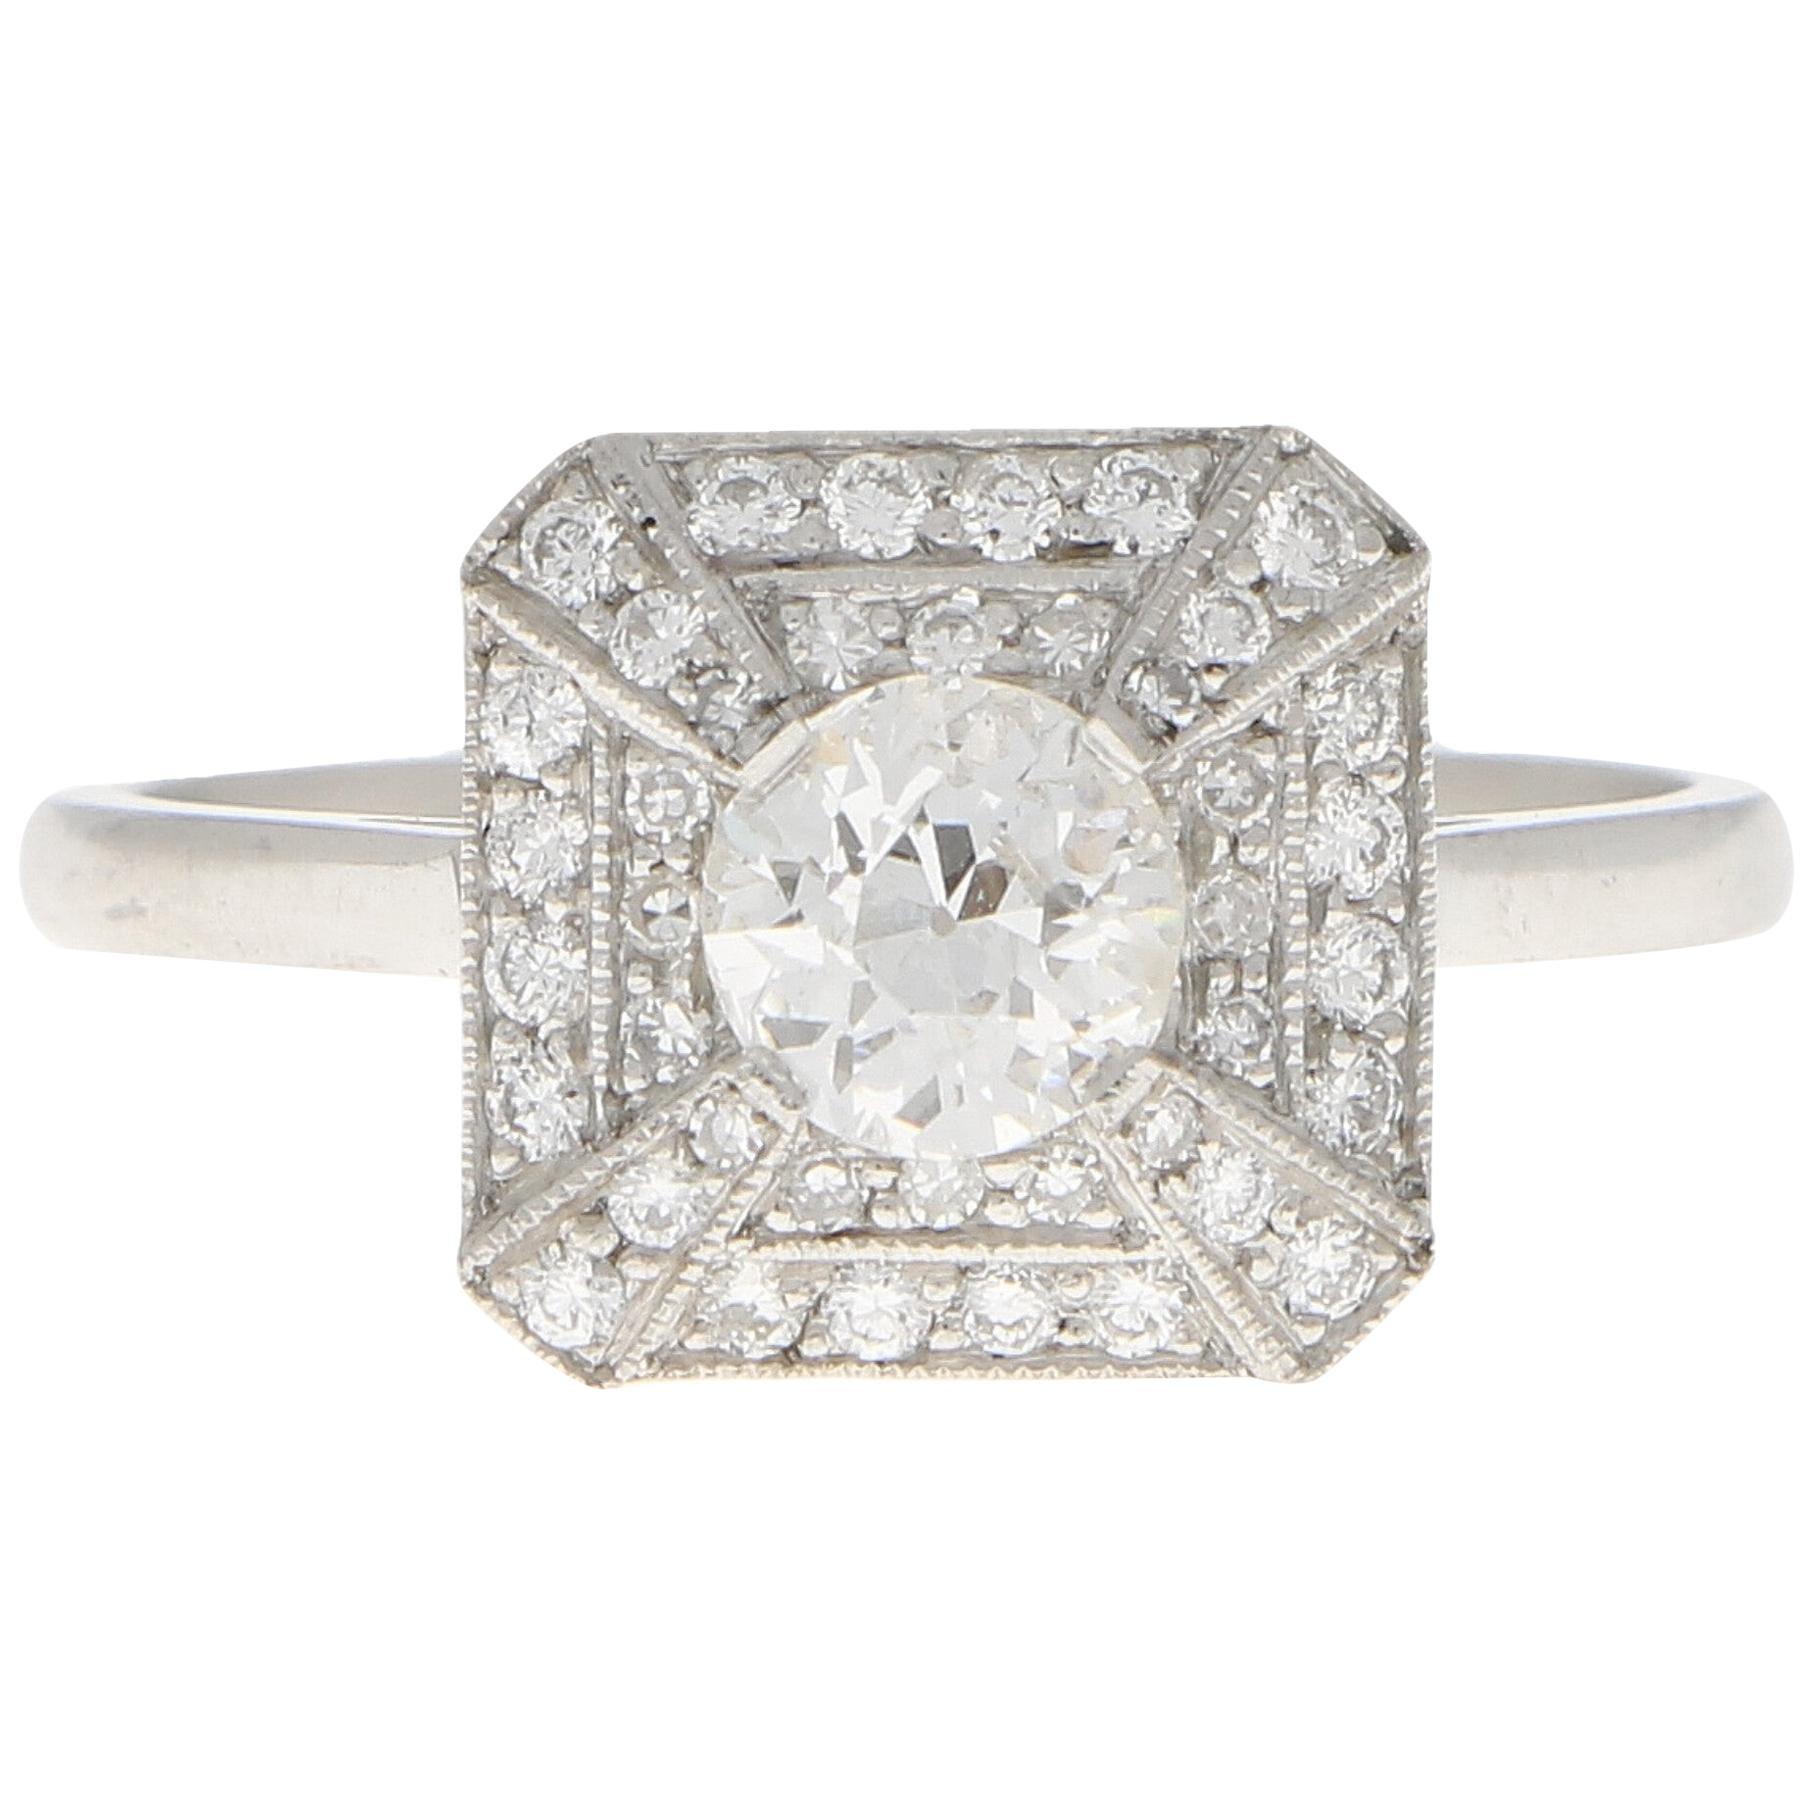 Art Deco Inspired Old Cut Diamond Engagement Ring Set in Platinum